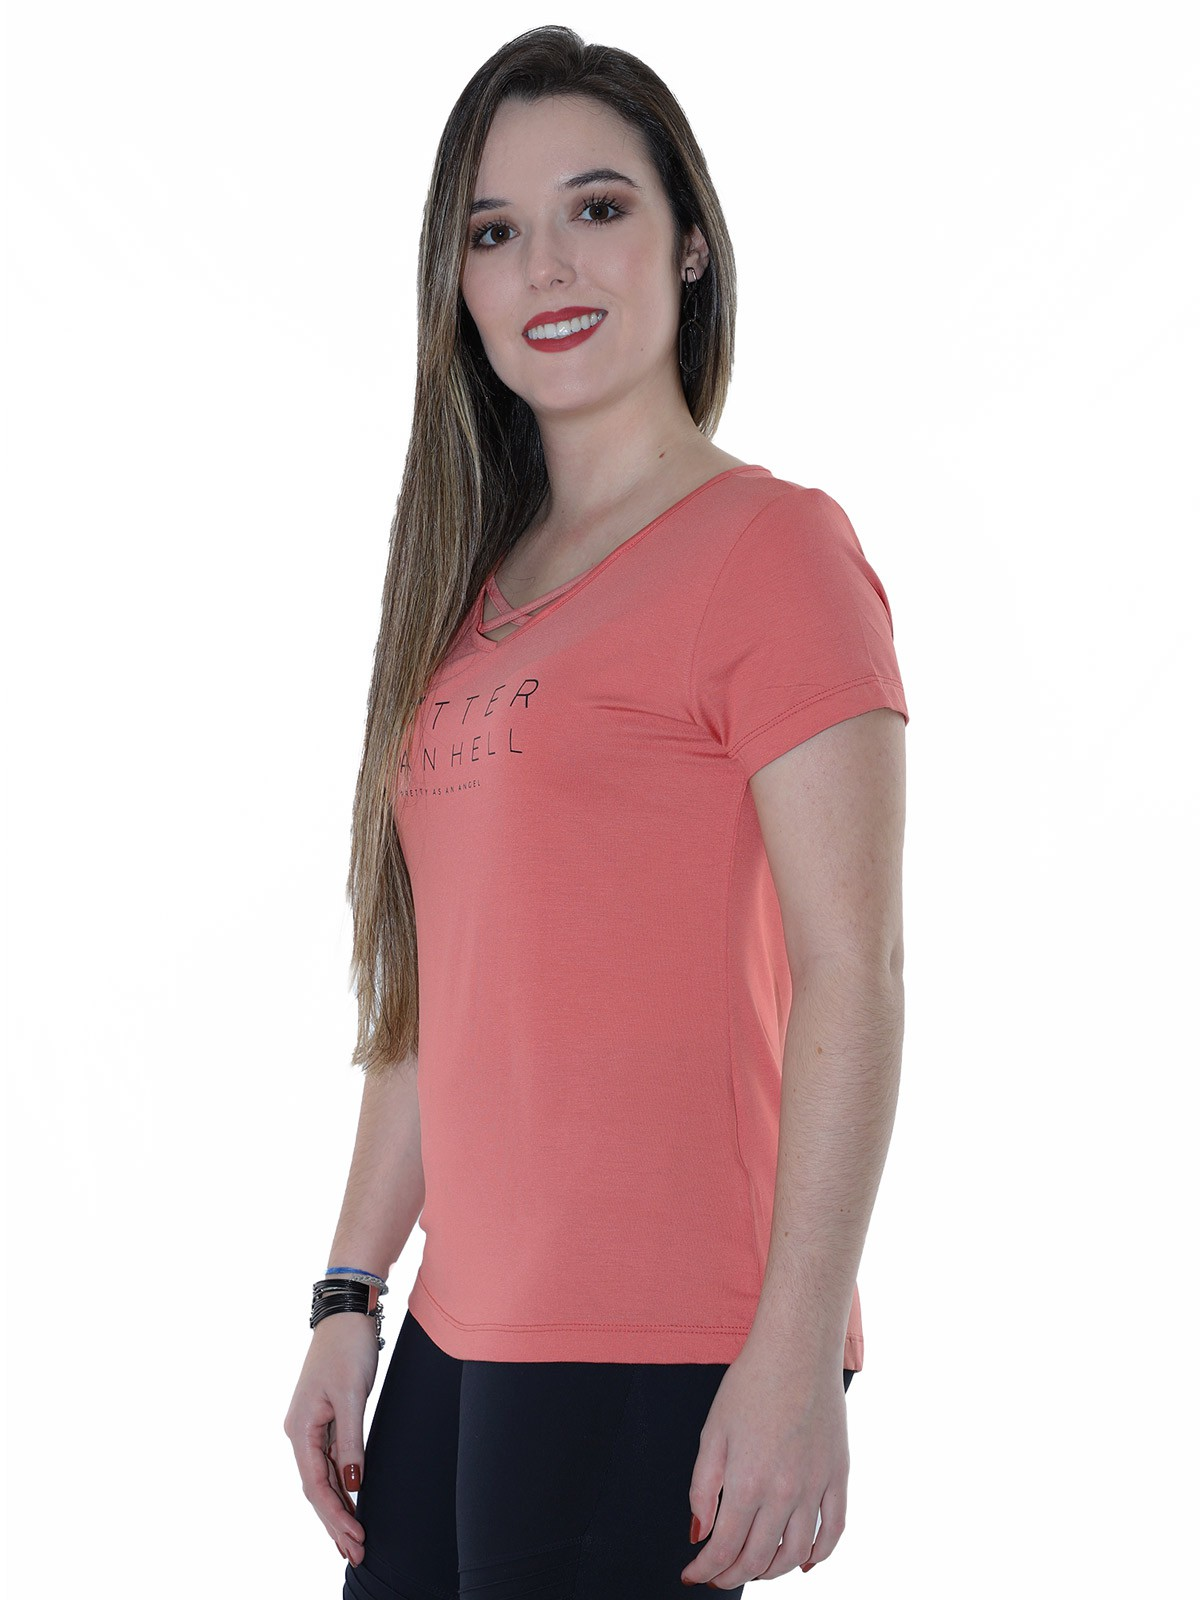 Blusa Feminina Longuete Decote Com Viés Anistia Rosê